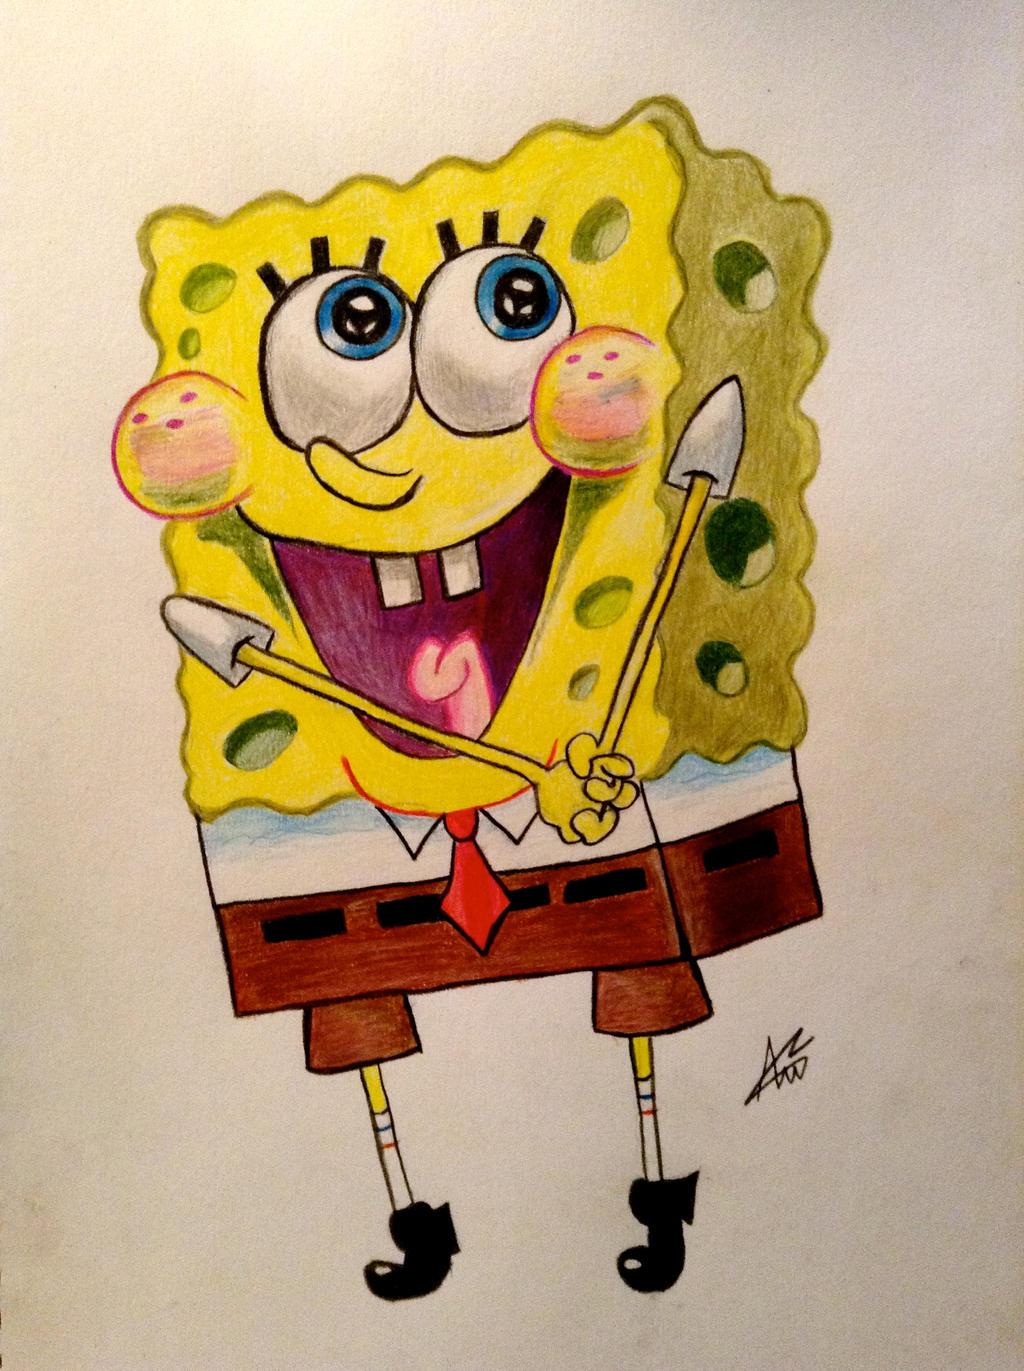 Spongebob Squarepants by Annzig